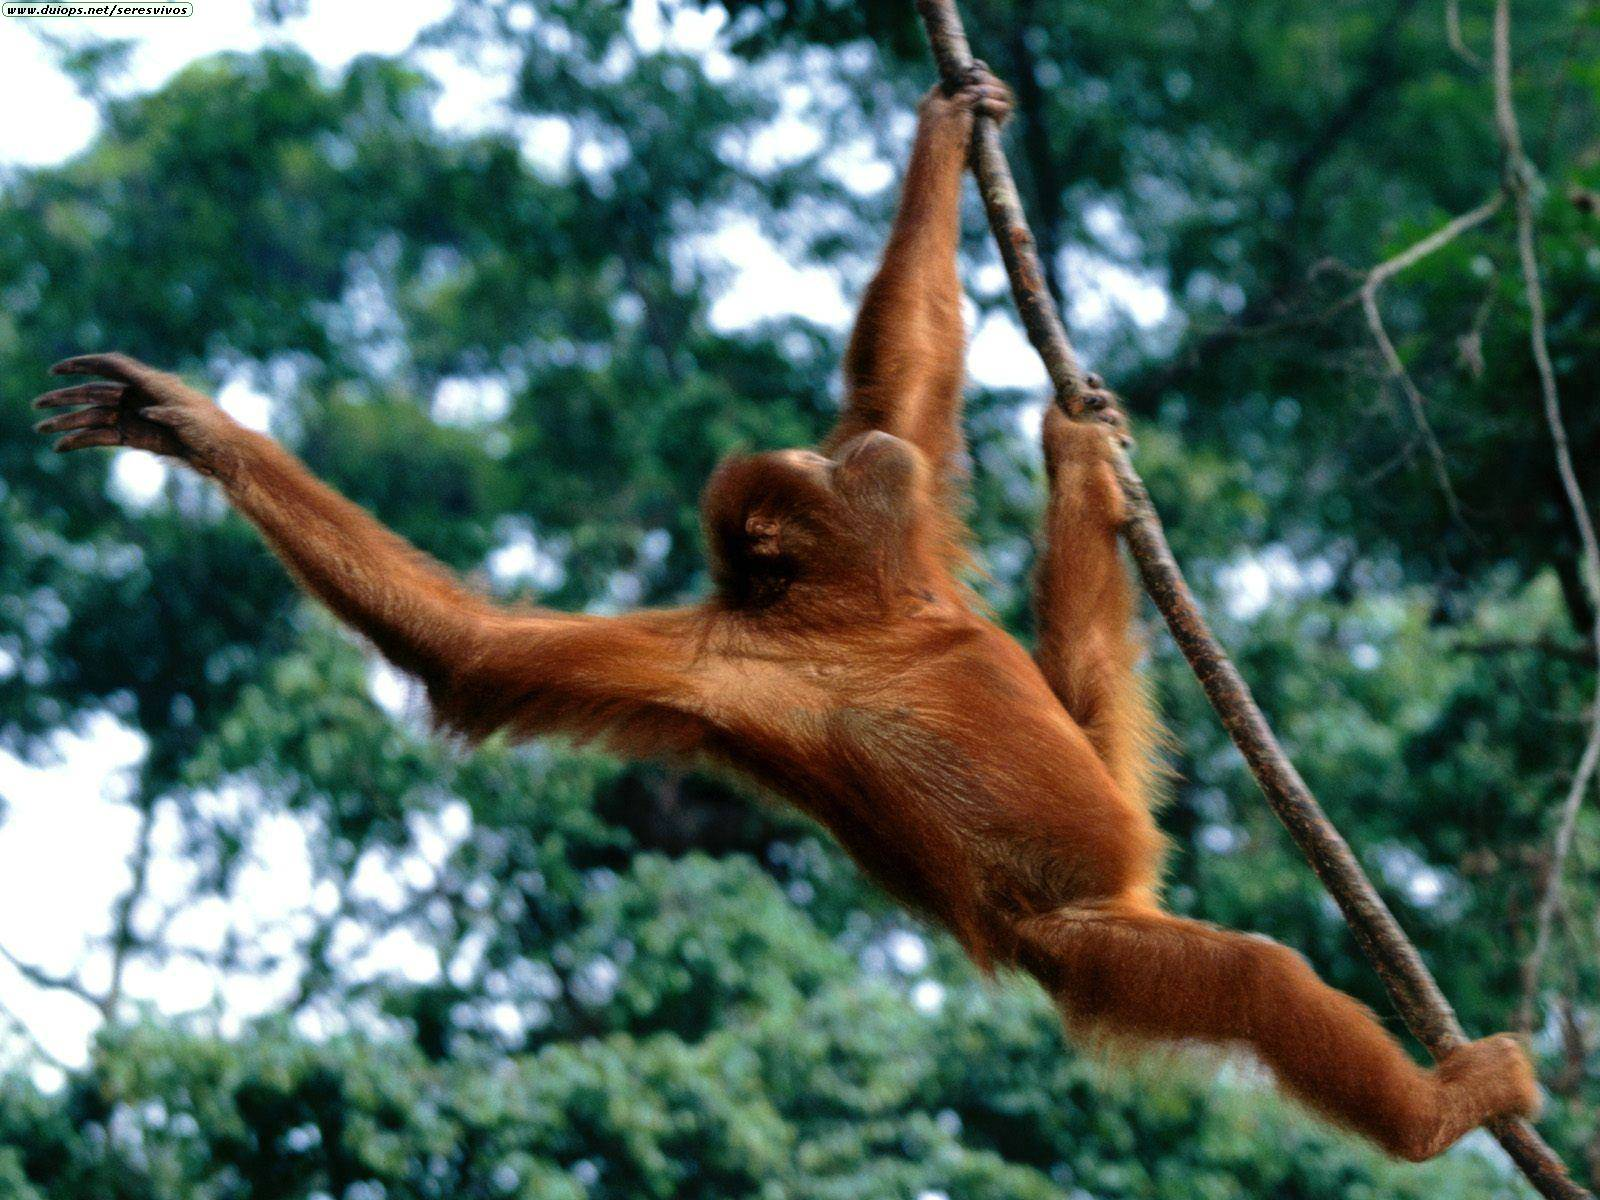 http://www.duiops.net/seresvivos/galeria/orangutanes/ph-13795.jpg